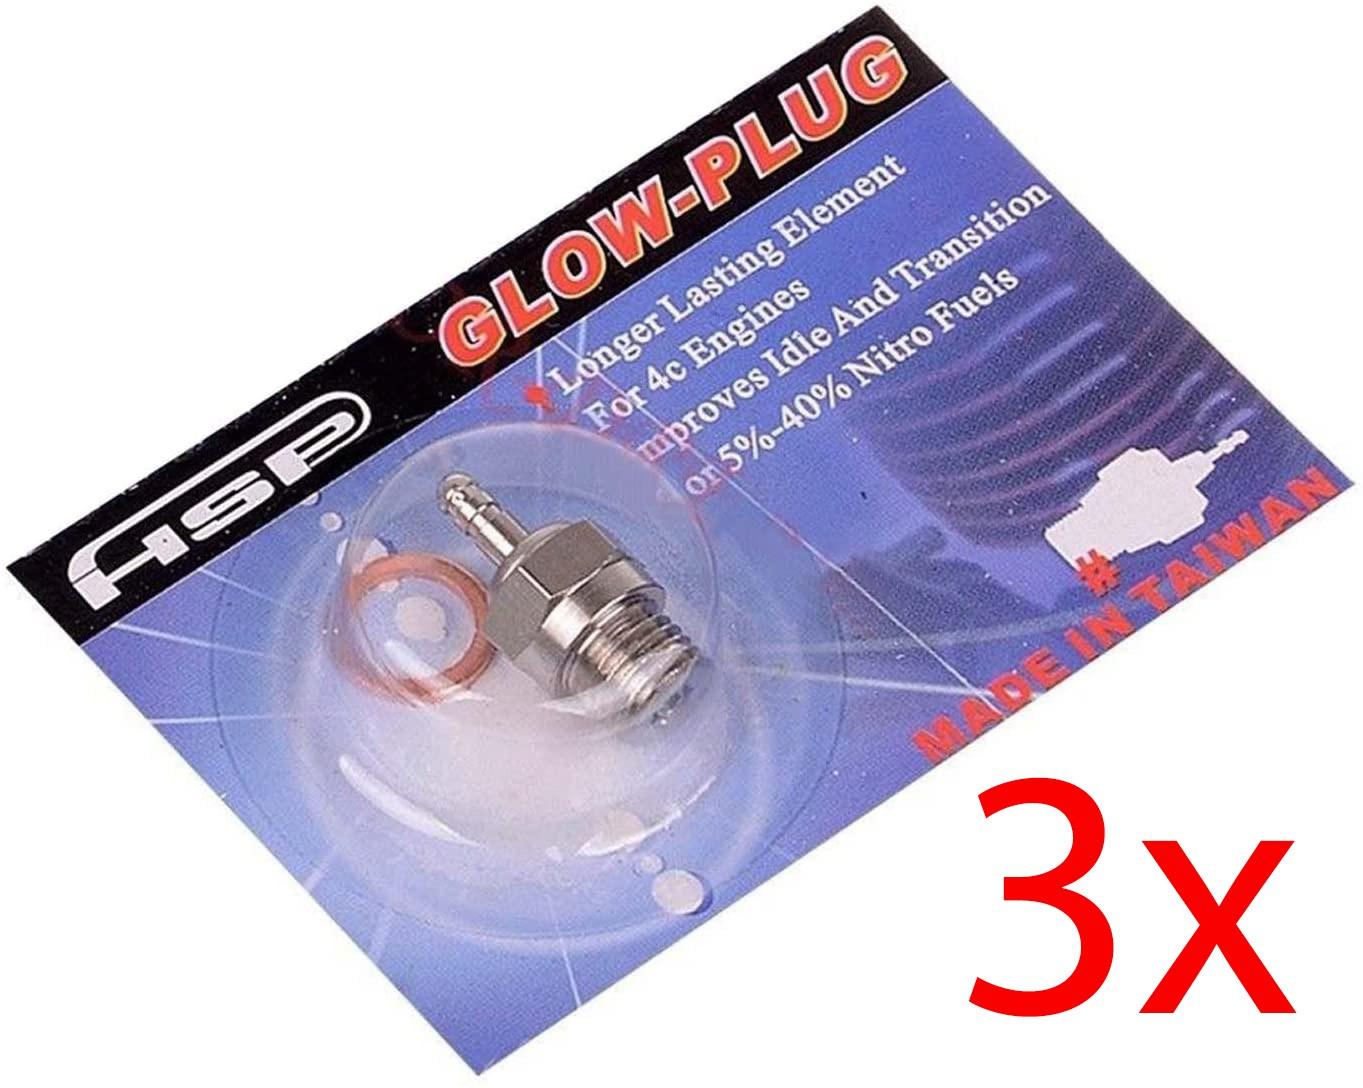 3x Vela Glow Plug Hsp N3 Hot / Quente